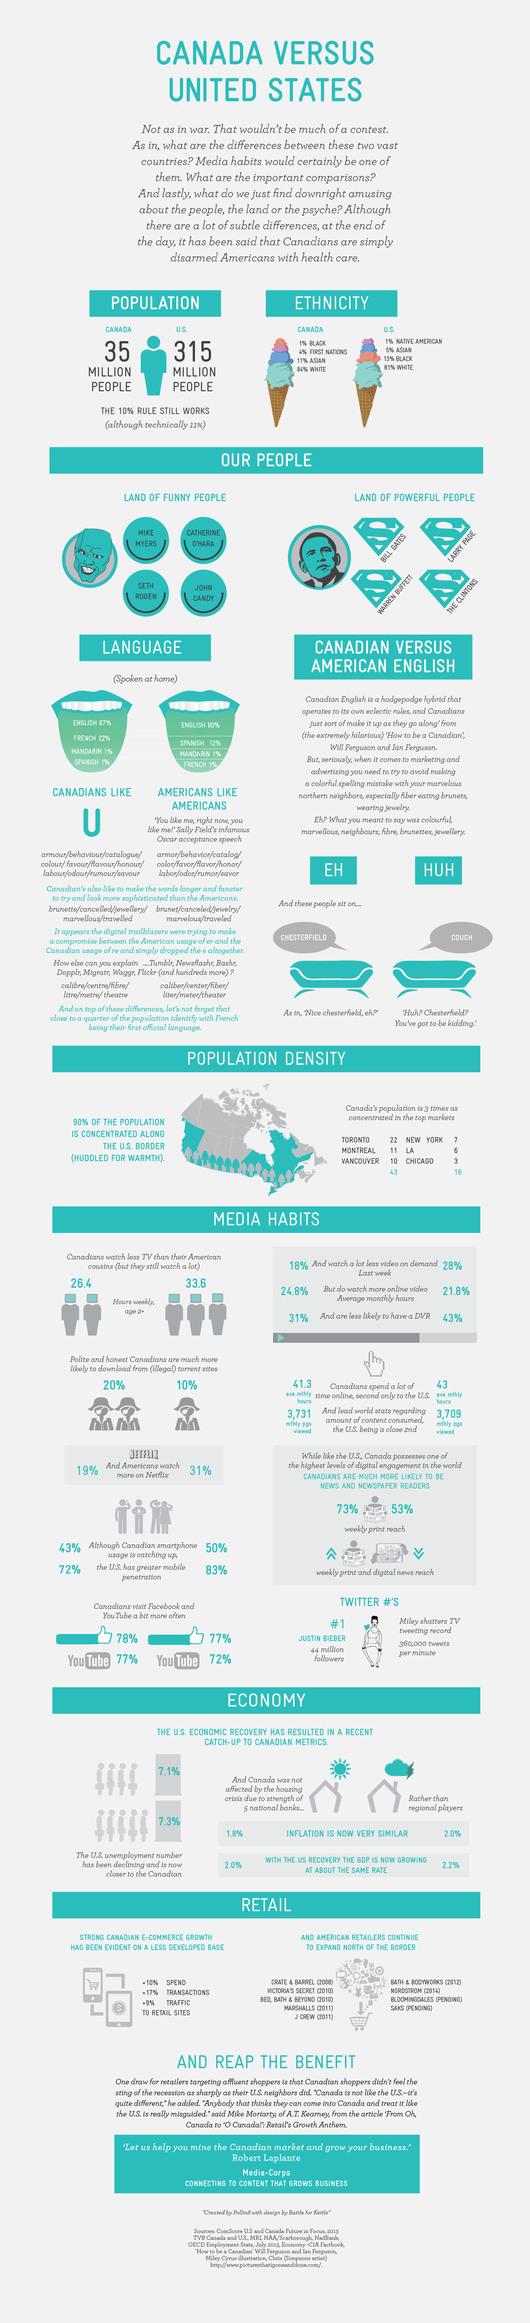 Media_Corps_infographic_s.jpg